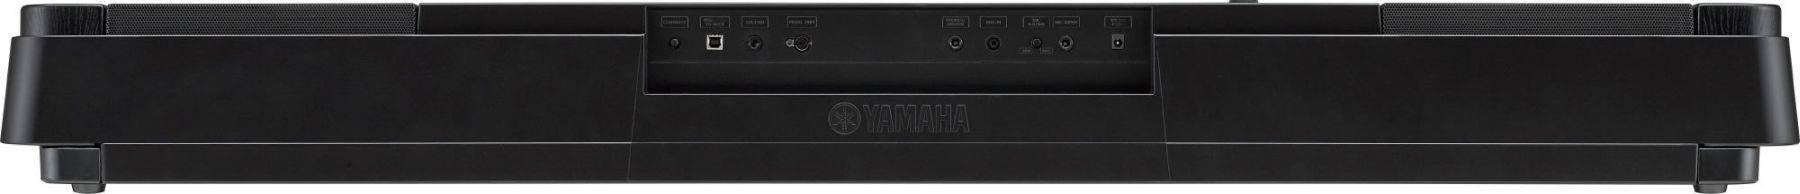 Yamaha DGX660-B 88-Key Electric Piano with Stand - Black Product Image 3